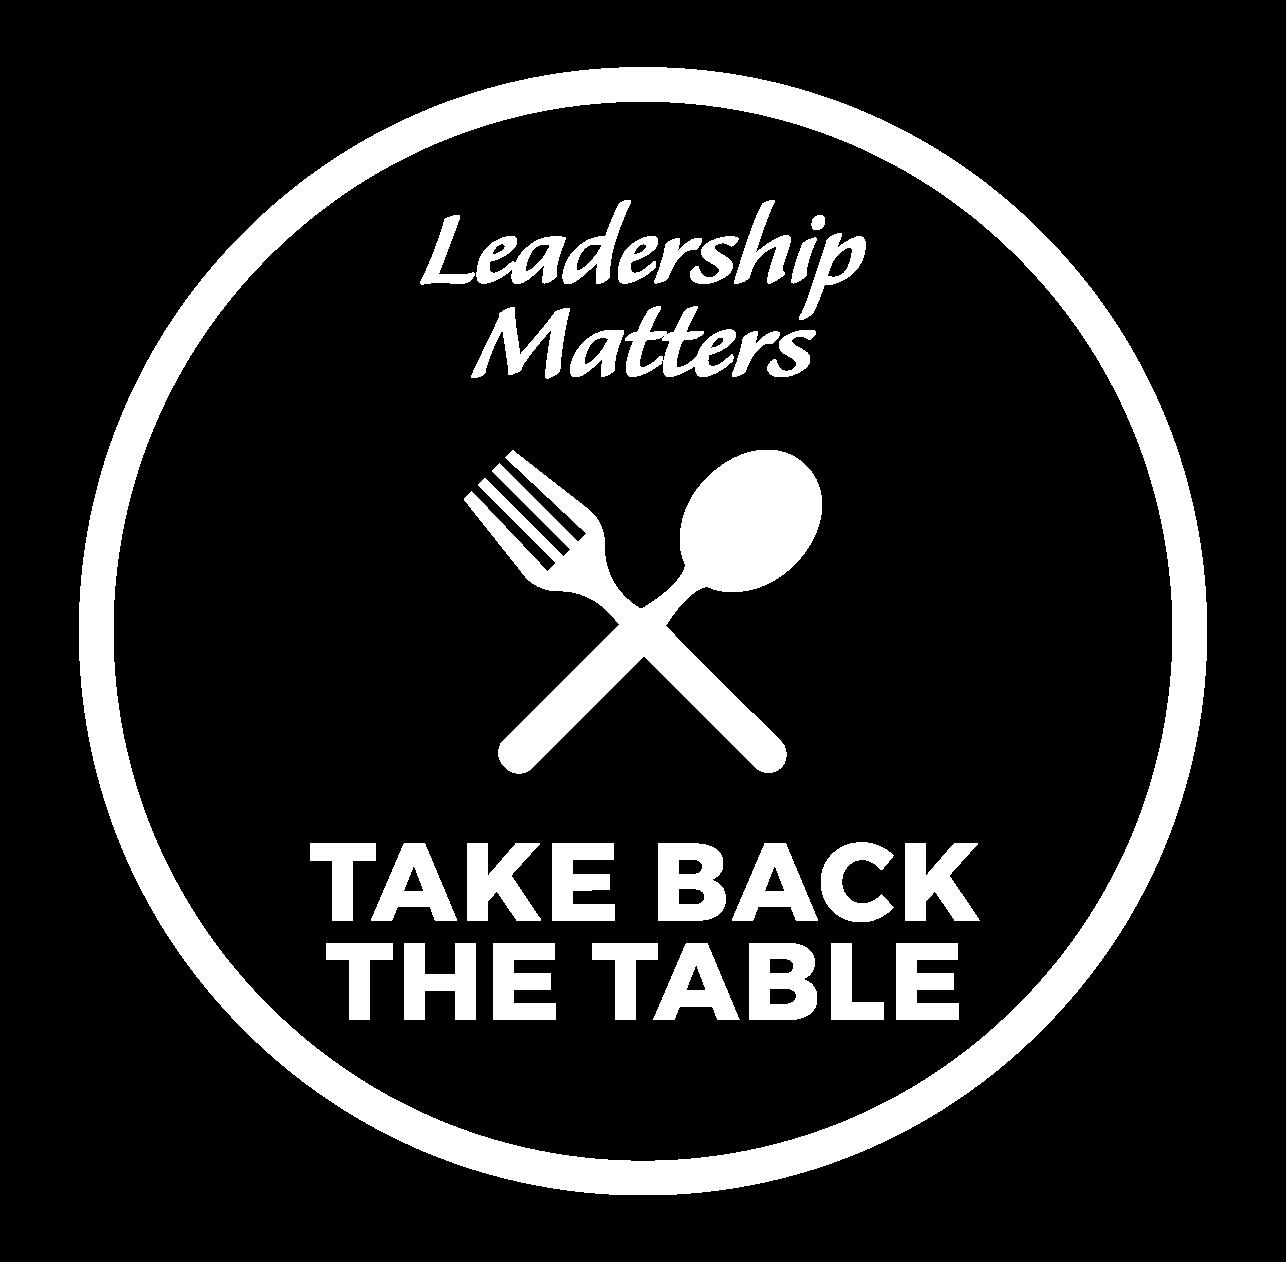 Take Back the Table logo